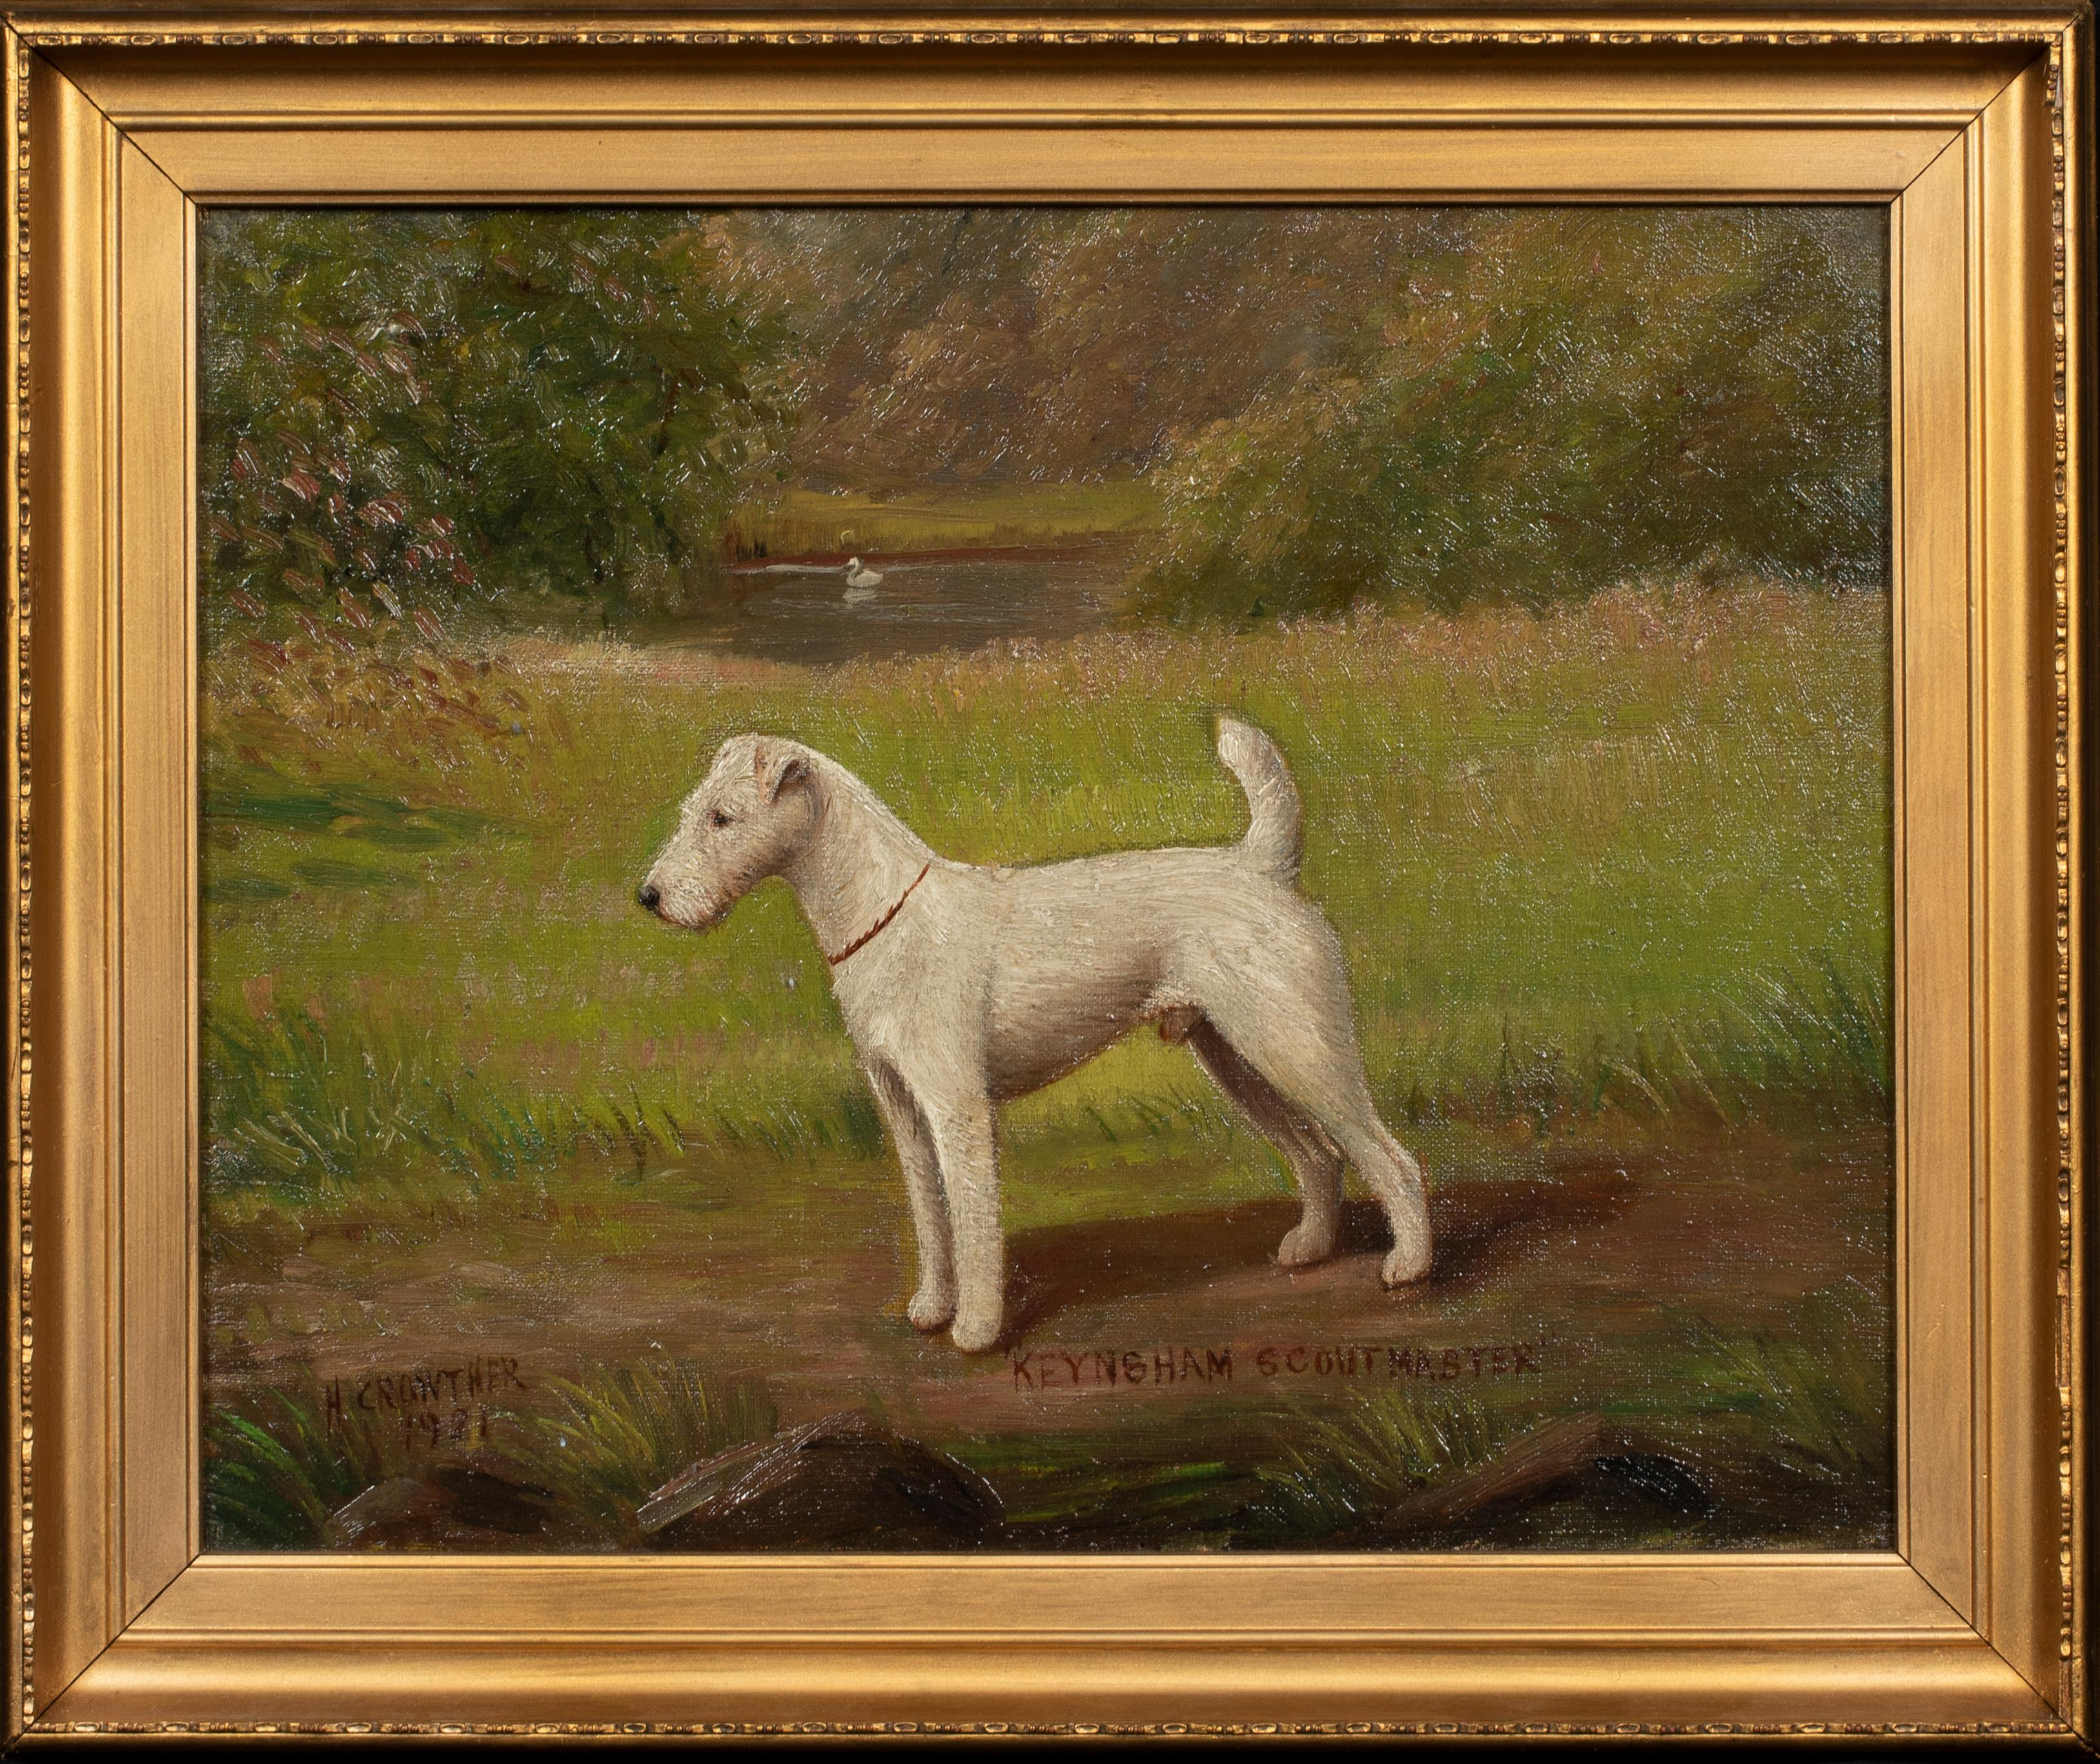 Portrait of 'Keynsham Scoutmaster', a Wire-haired Fox Terrier, circa 1900